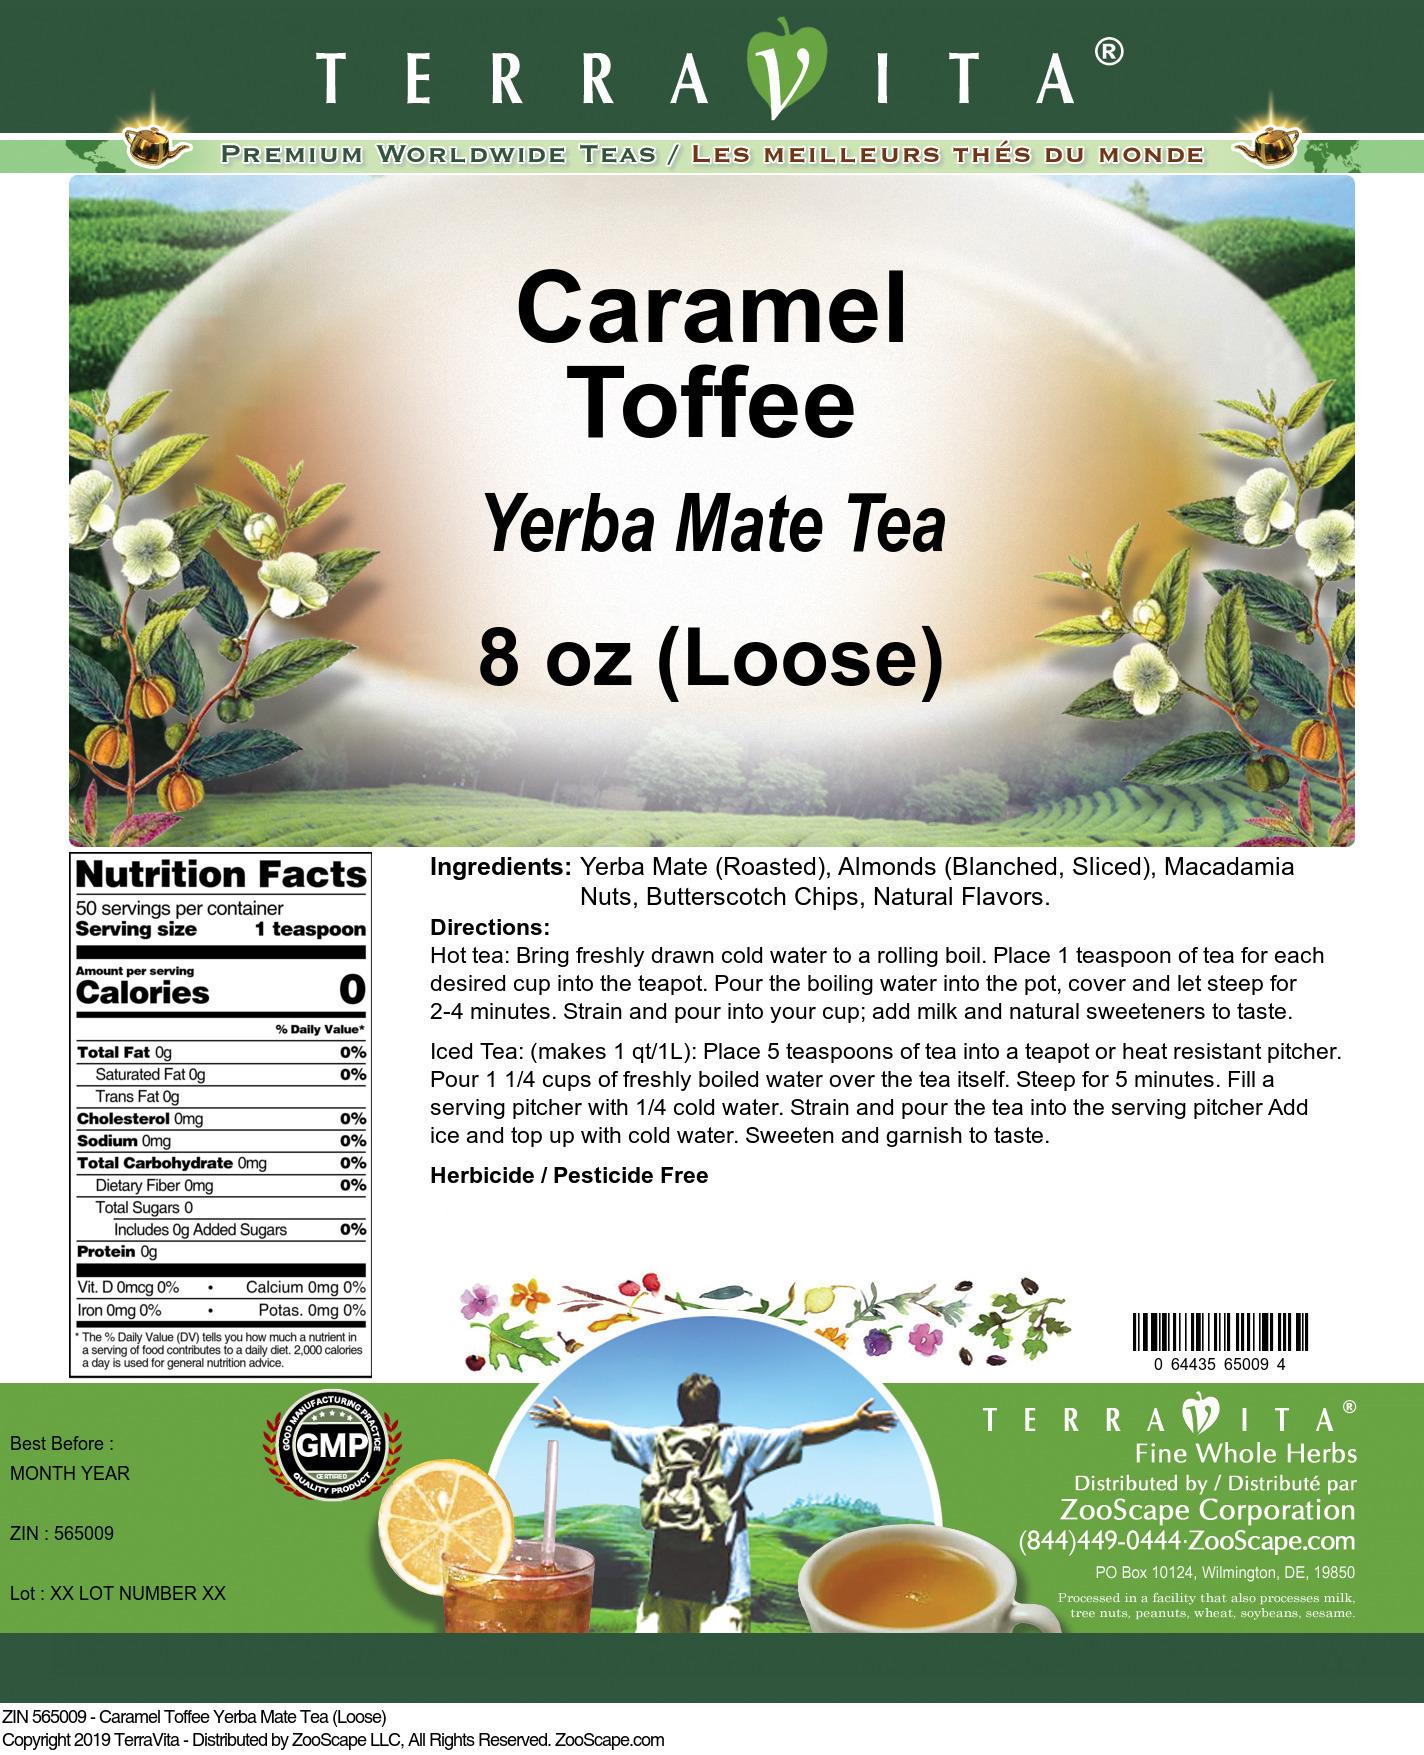 Caramel Toffee Yerba Mate Tea (Loose)